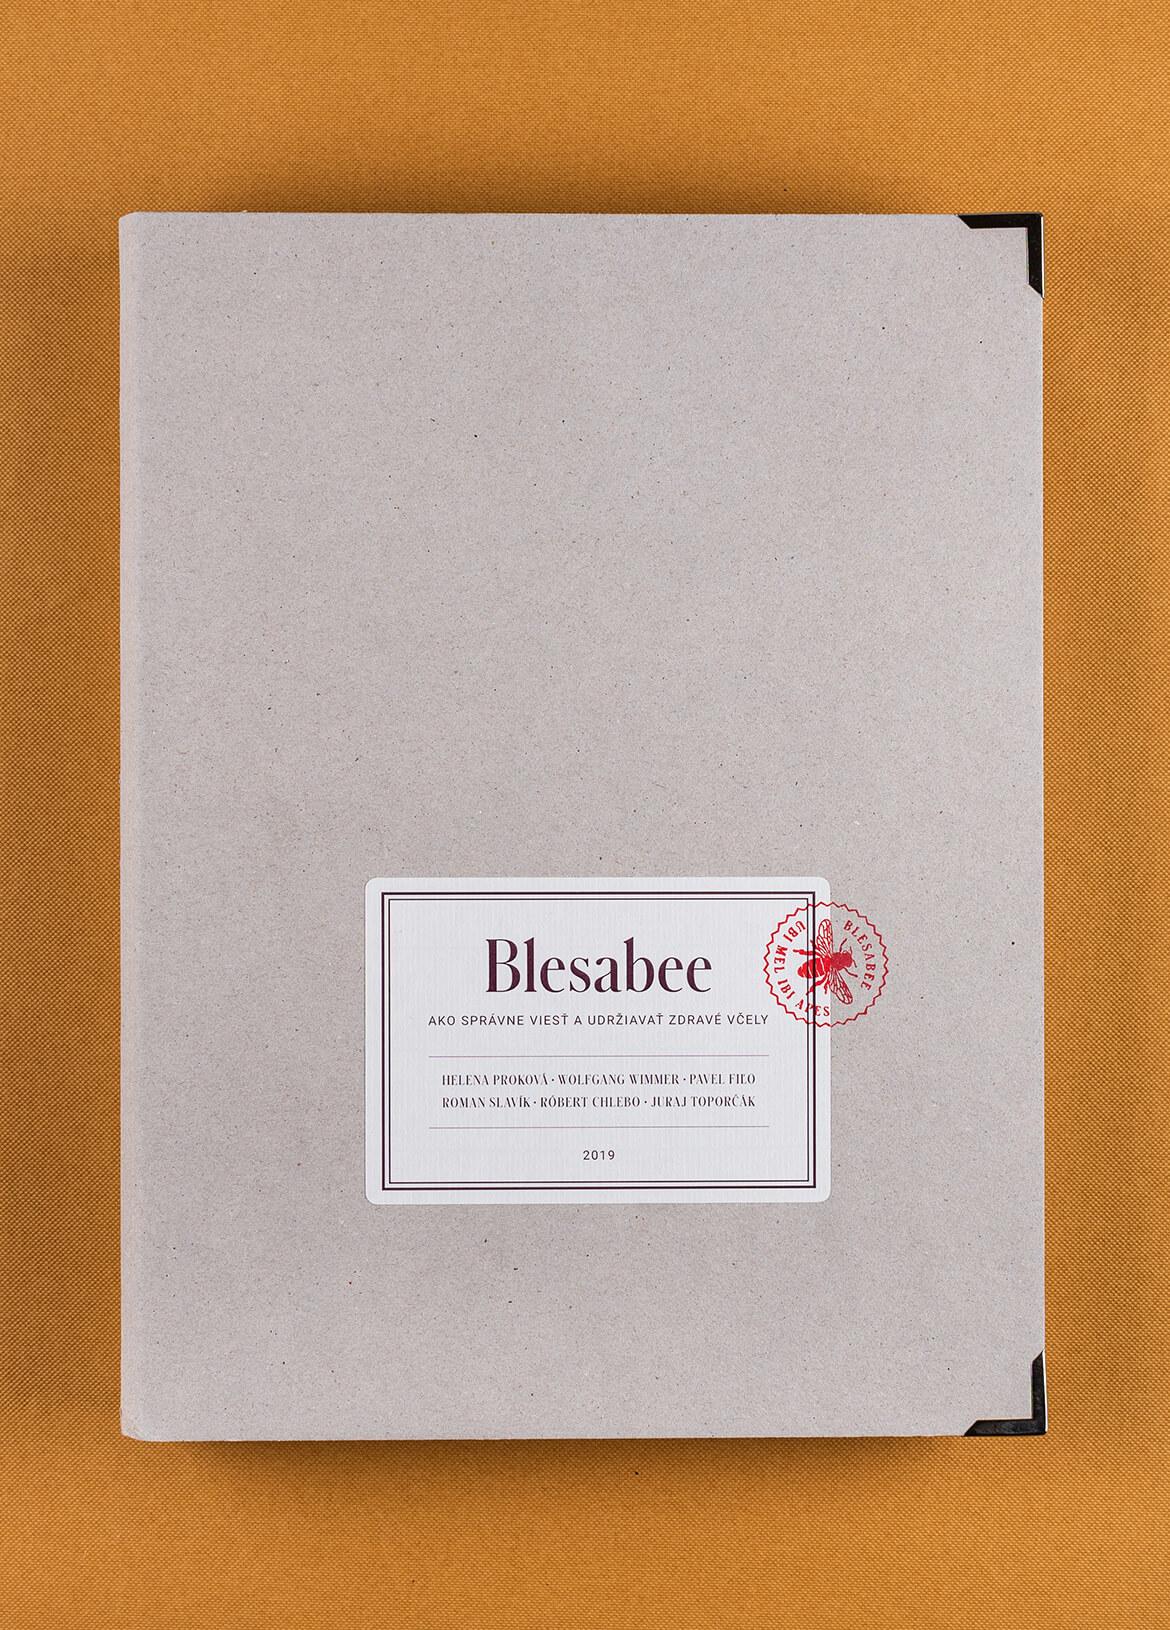 Blesabee